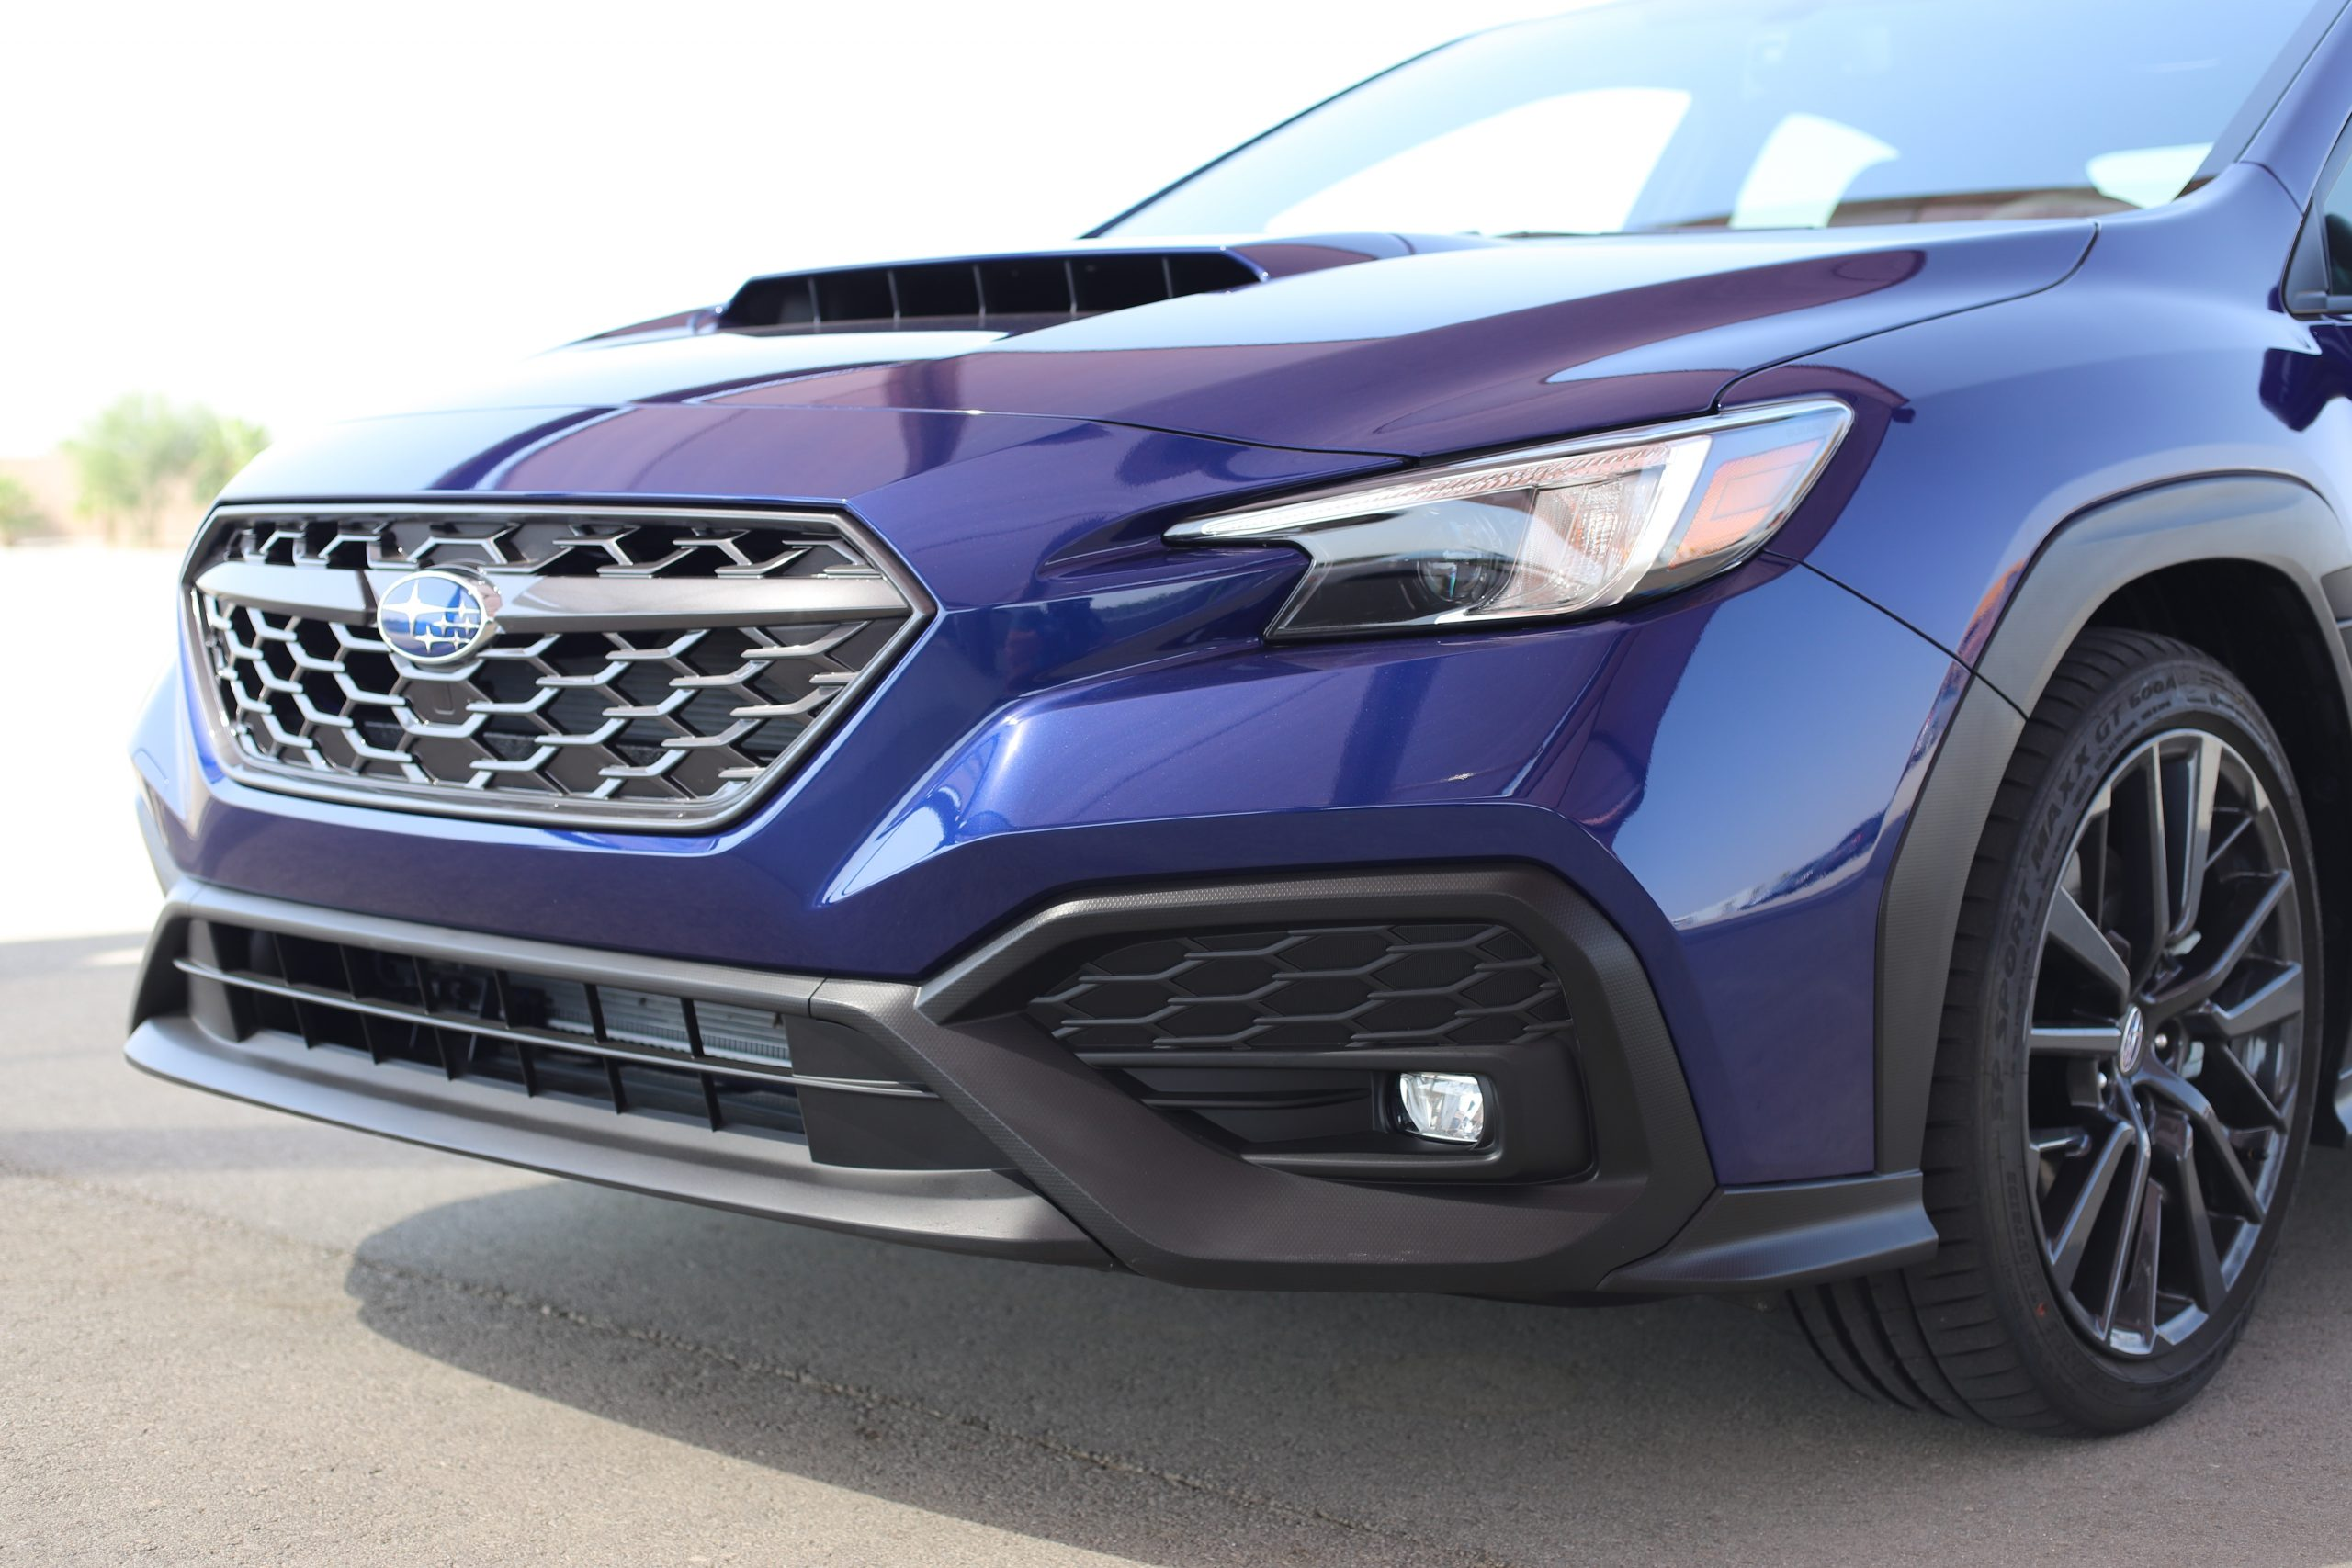 2022 Subaru WRX blue front end close